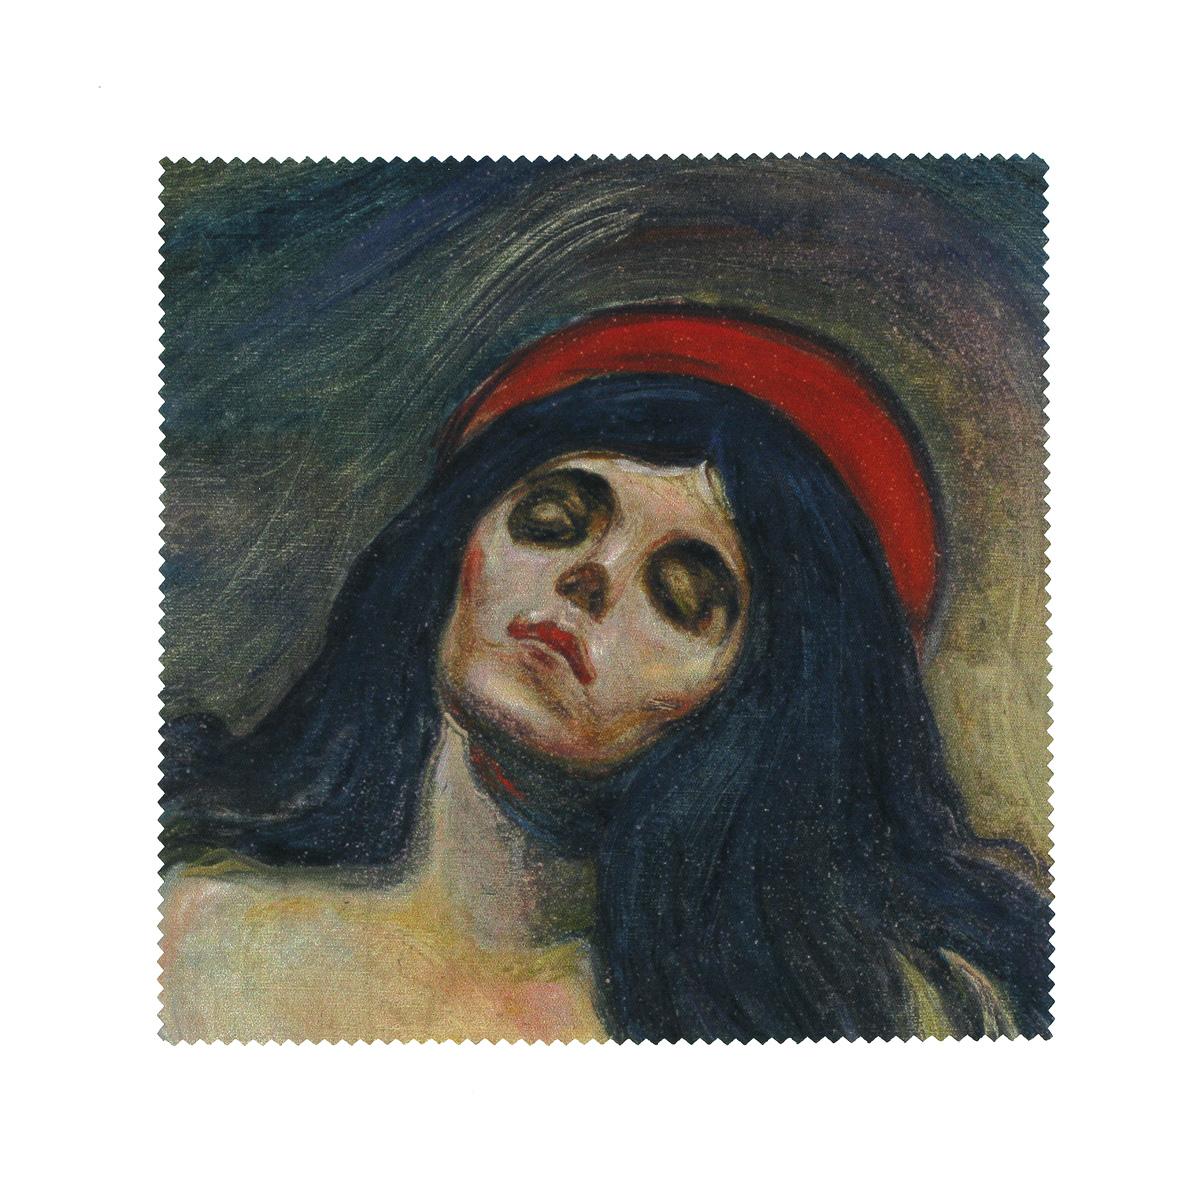 Edvard Munch's Madonna Lens Cloth